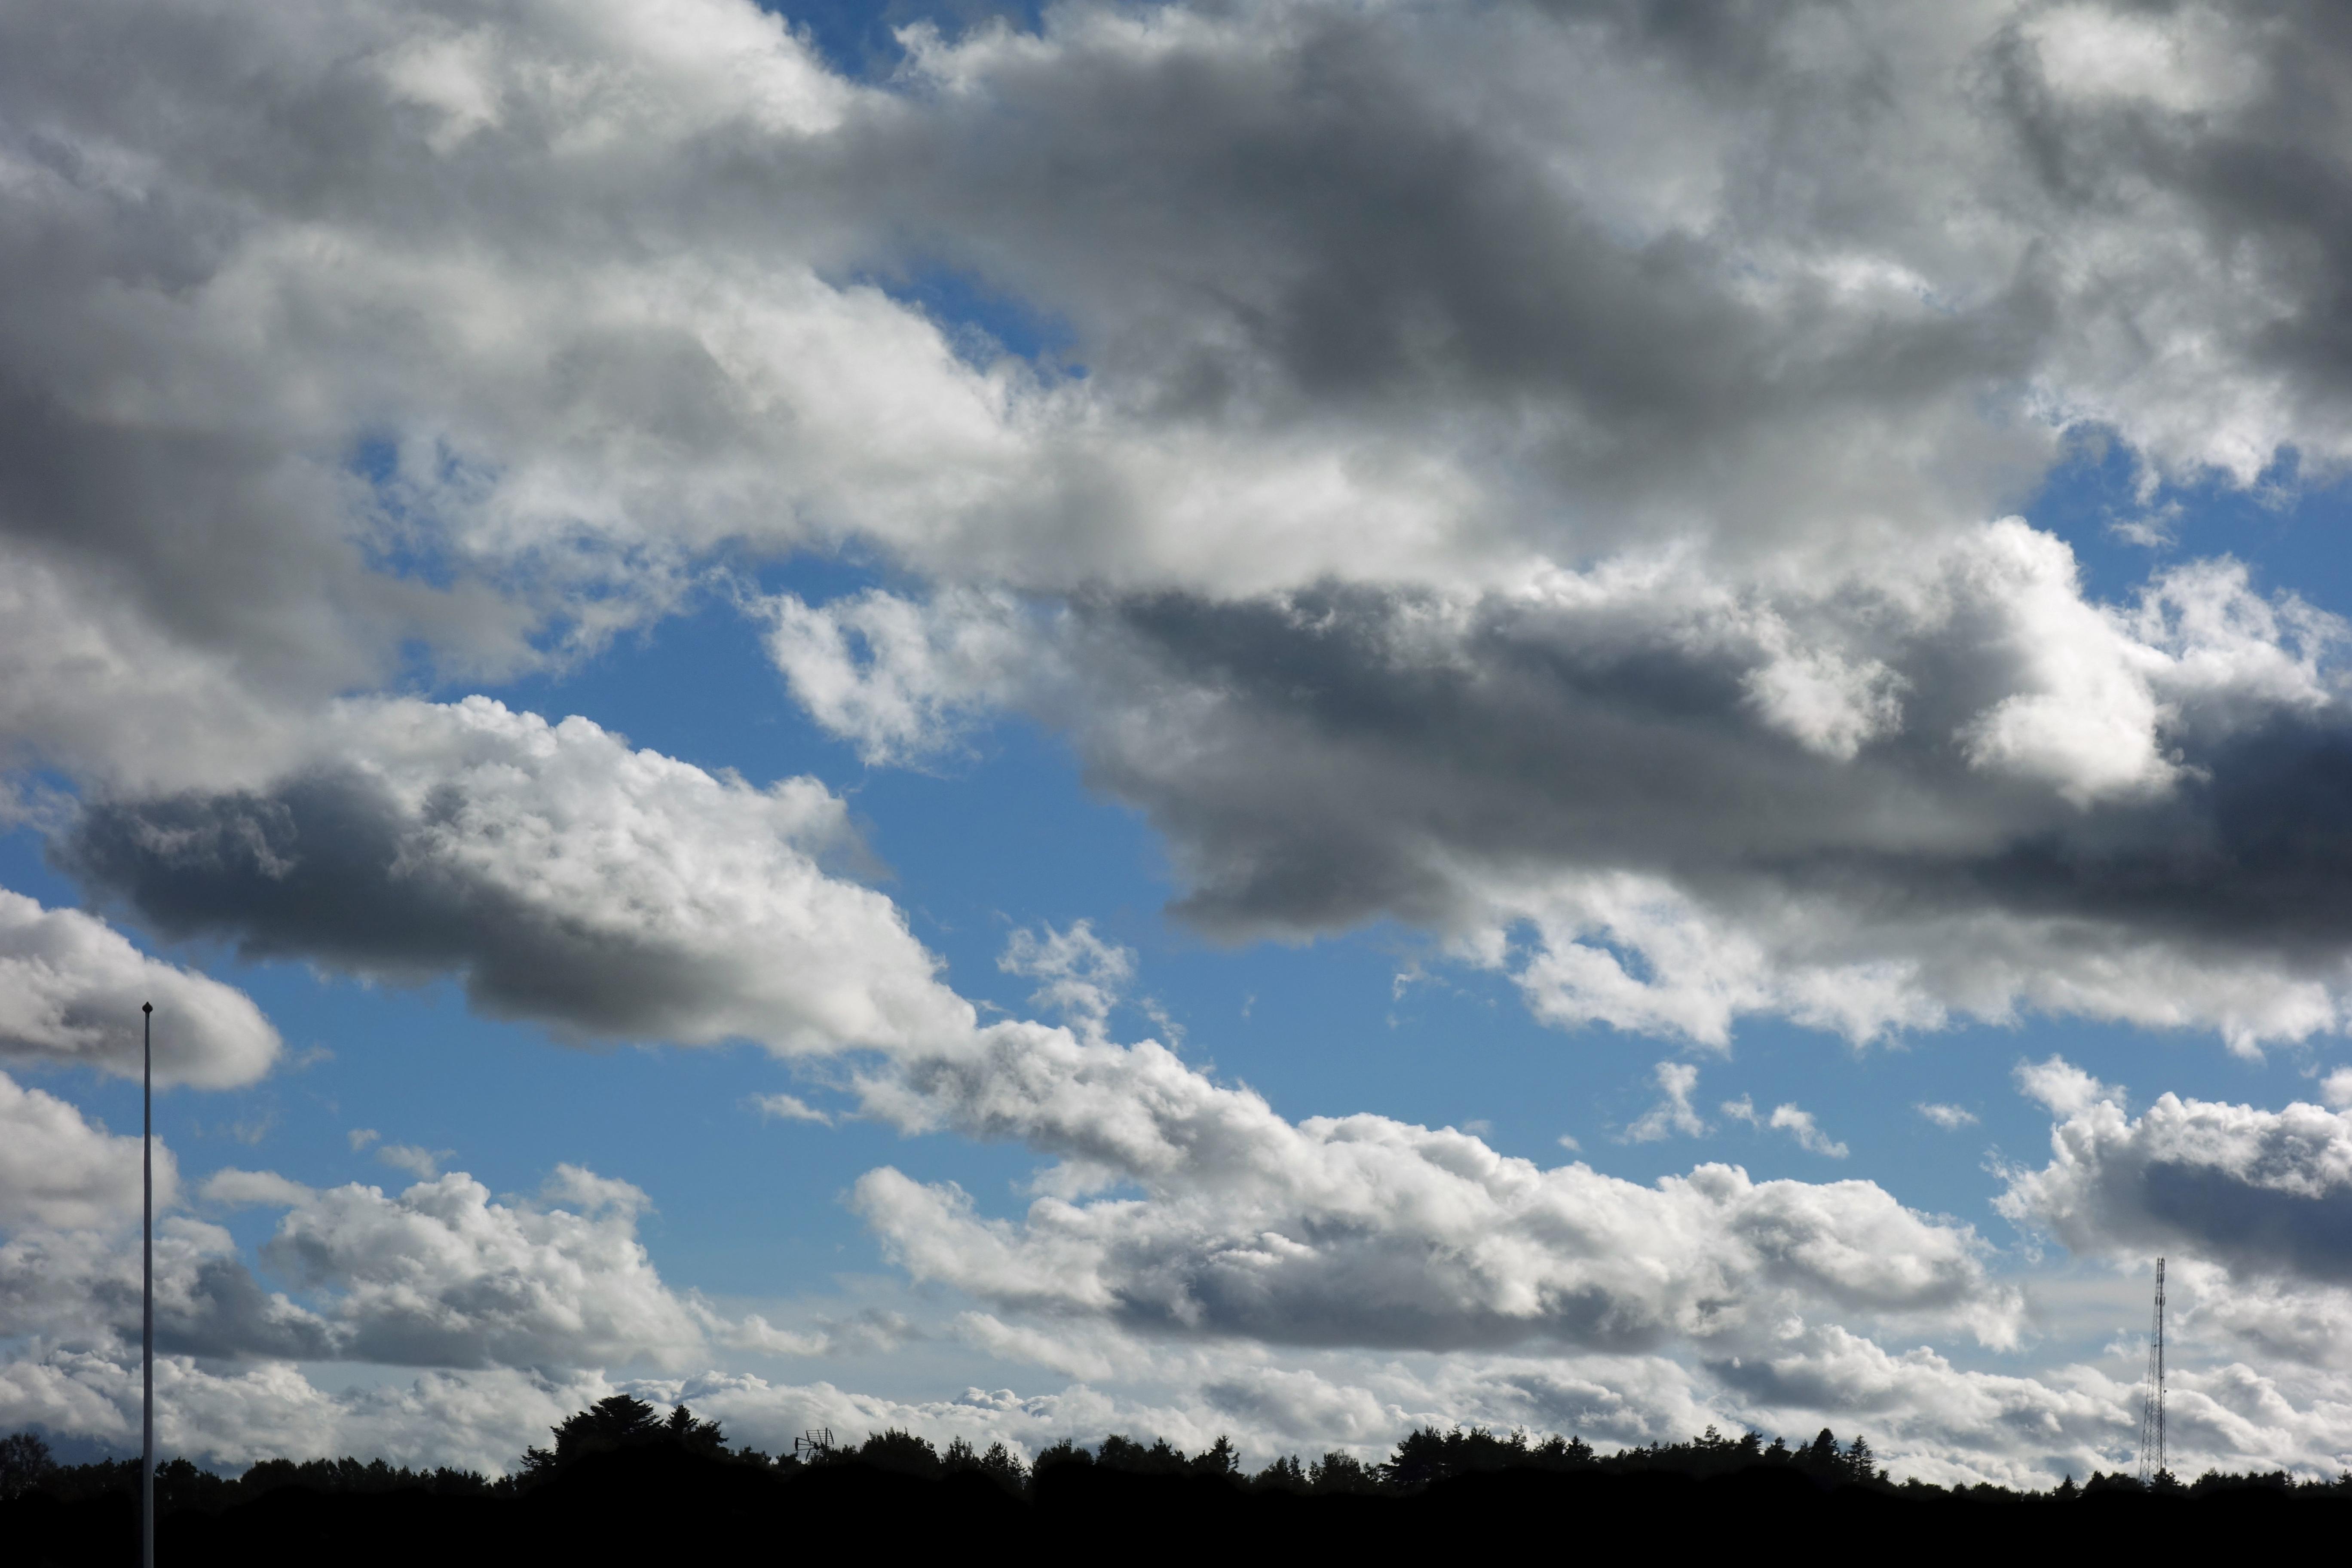 Definitions of clouds | International Cloud Atlas |Stratocumulus Clouds Description